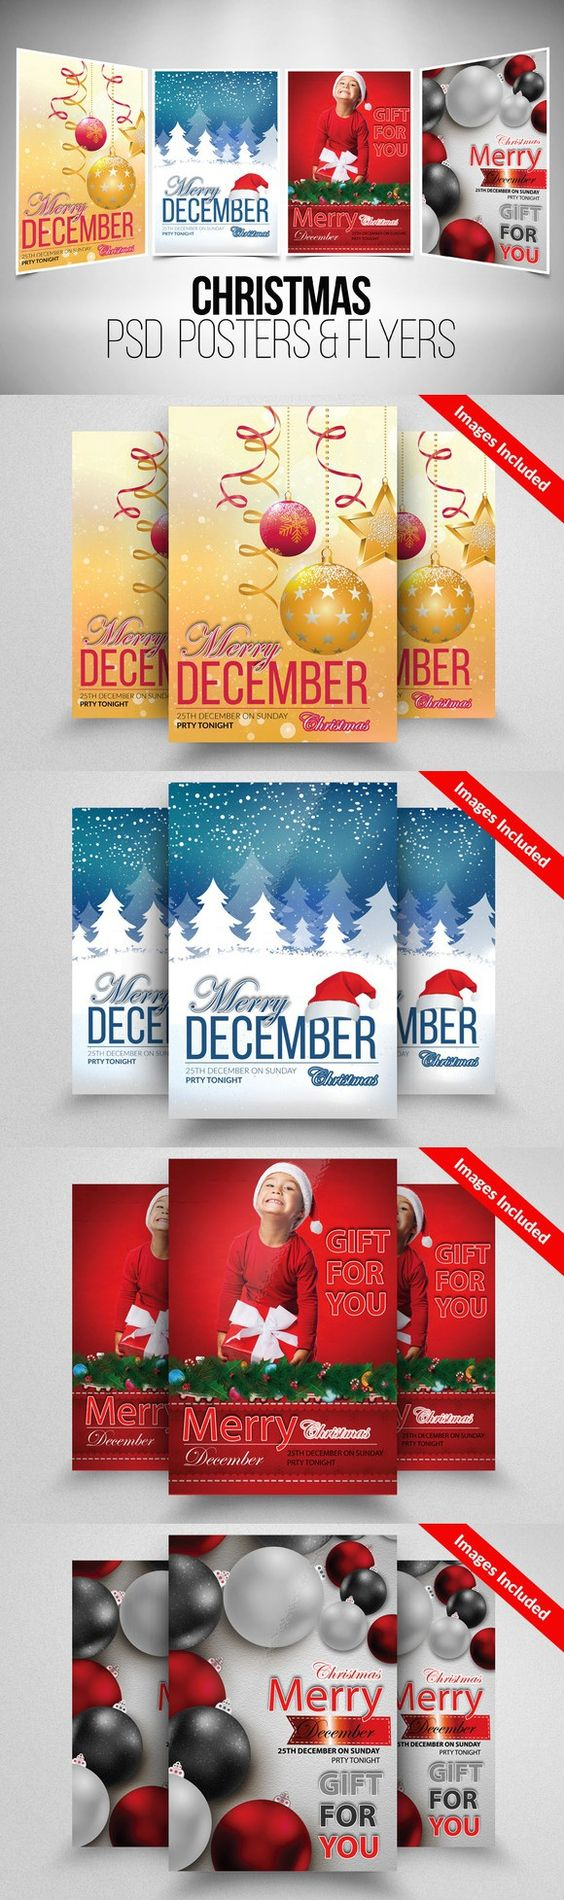 christmas flyer template bundle flyers flyer template and poster 4 christmas flyer template bundle poster templates 12 00